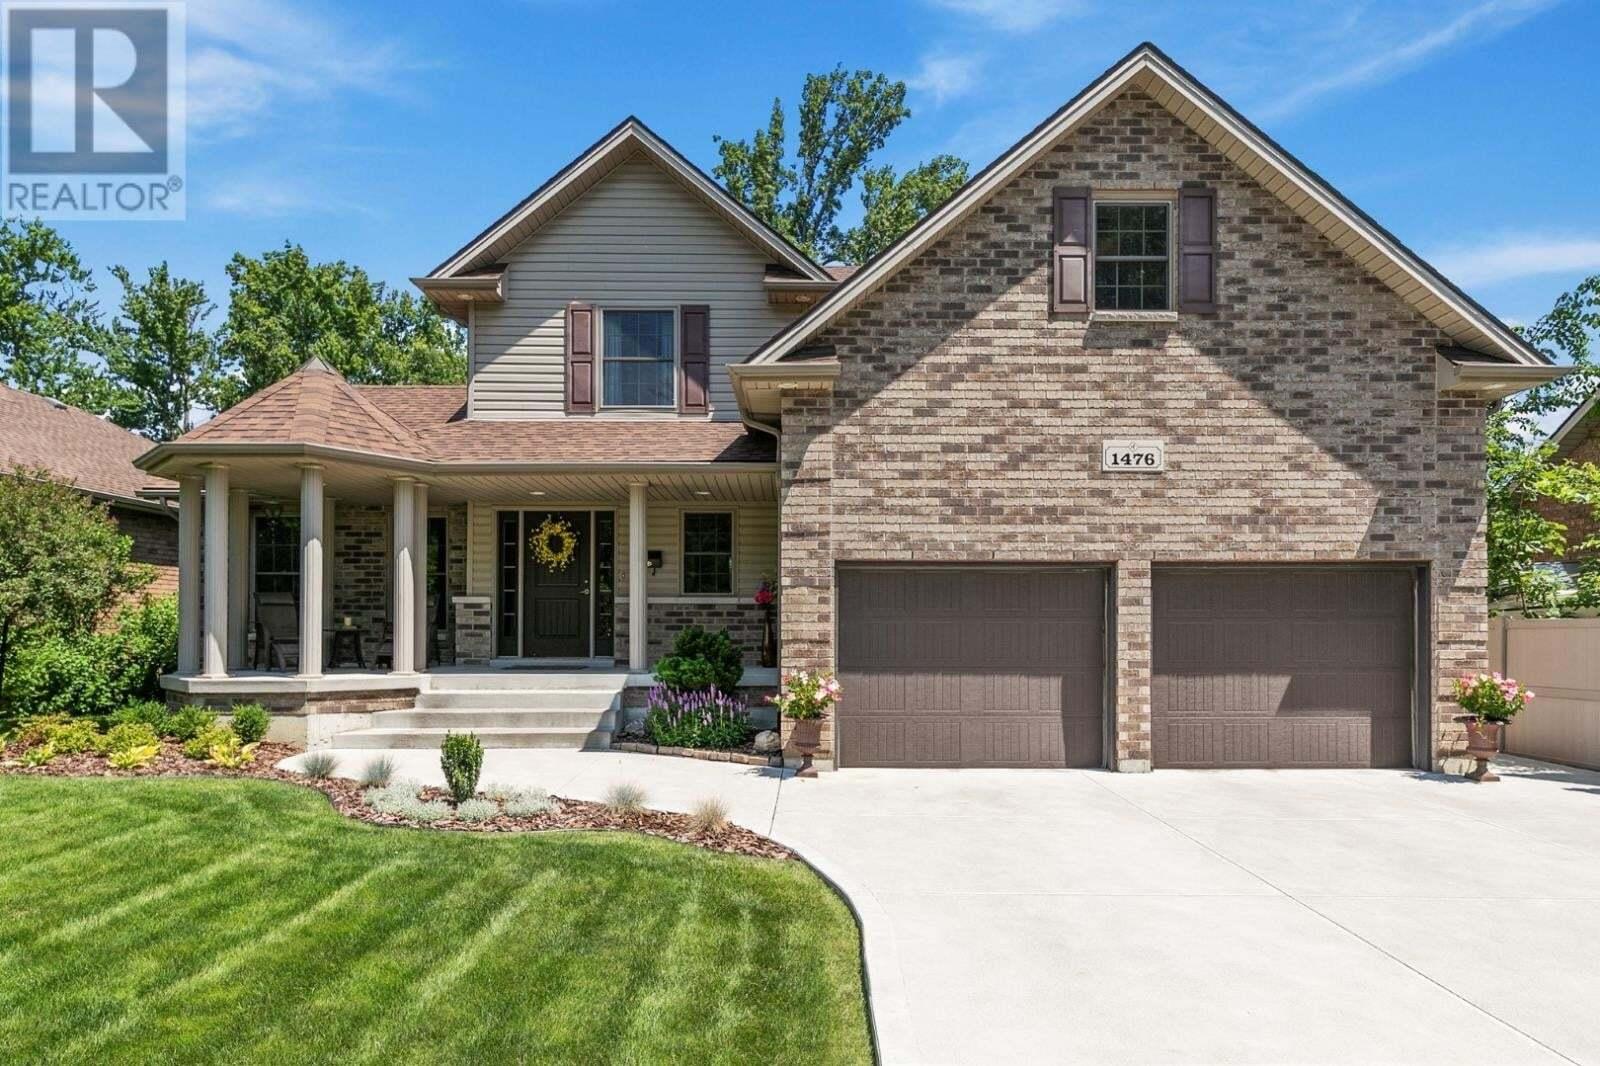 House for sale at 1476 Bouffard  Lasalle Ontario - MLS: 20008073